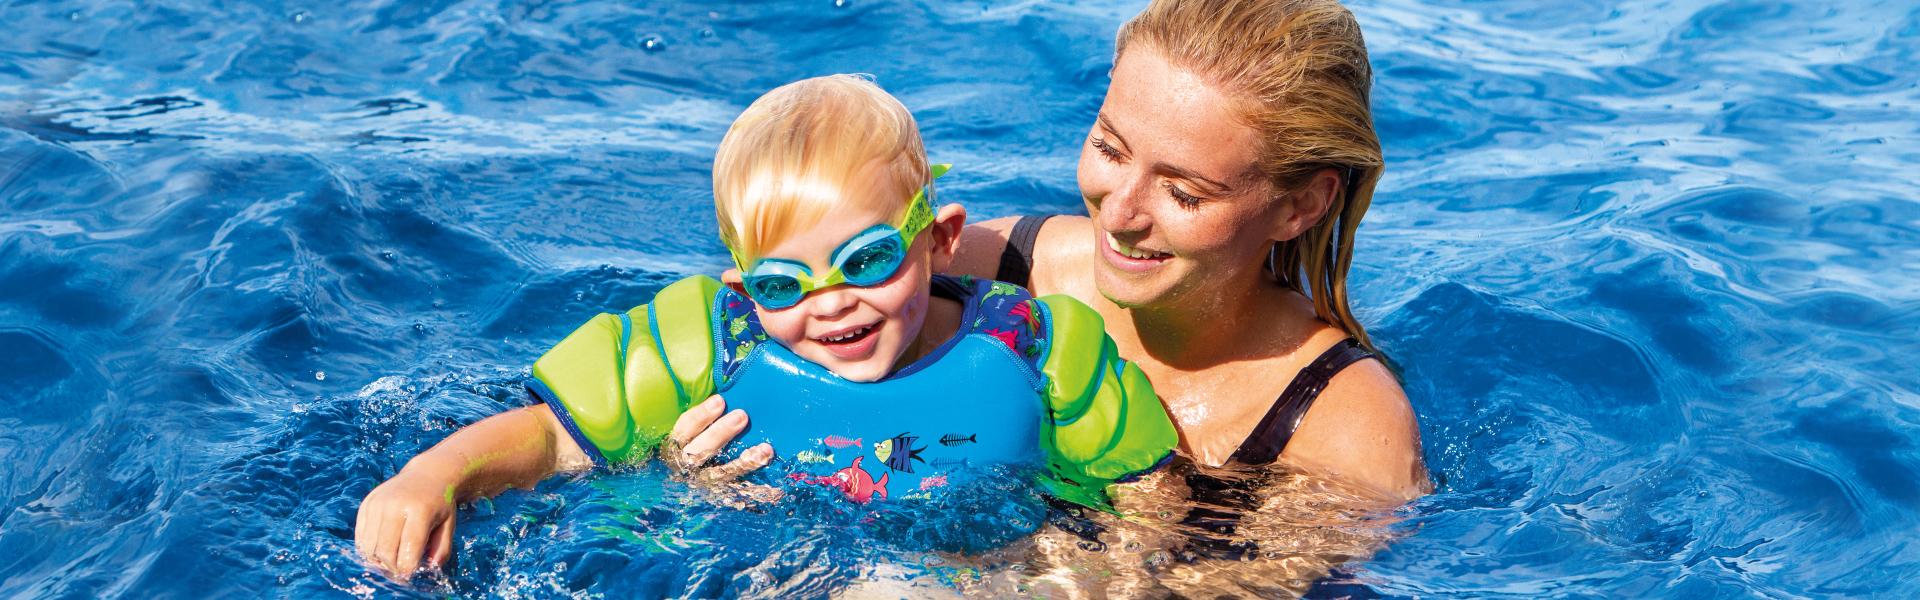 5 Essential Swim Safety Tips for Children